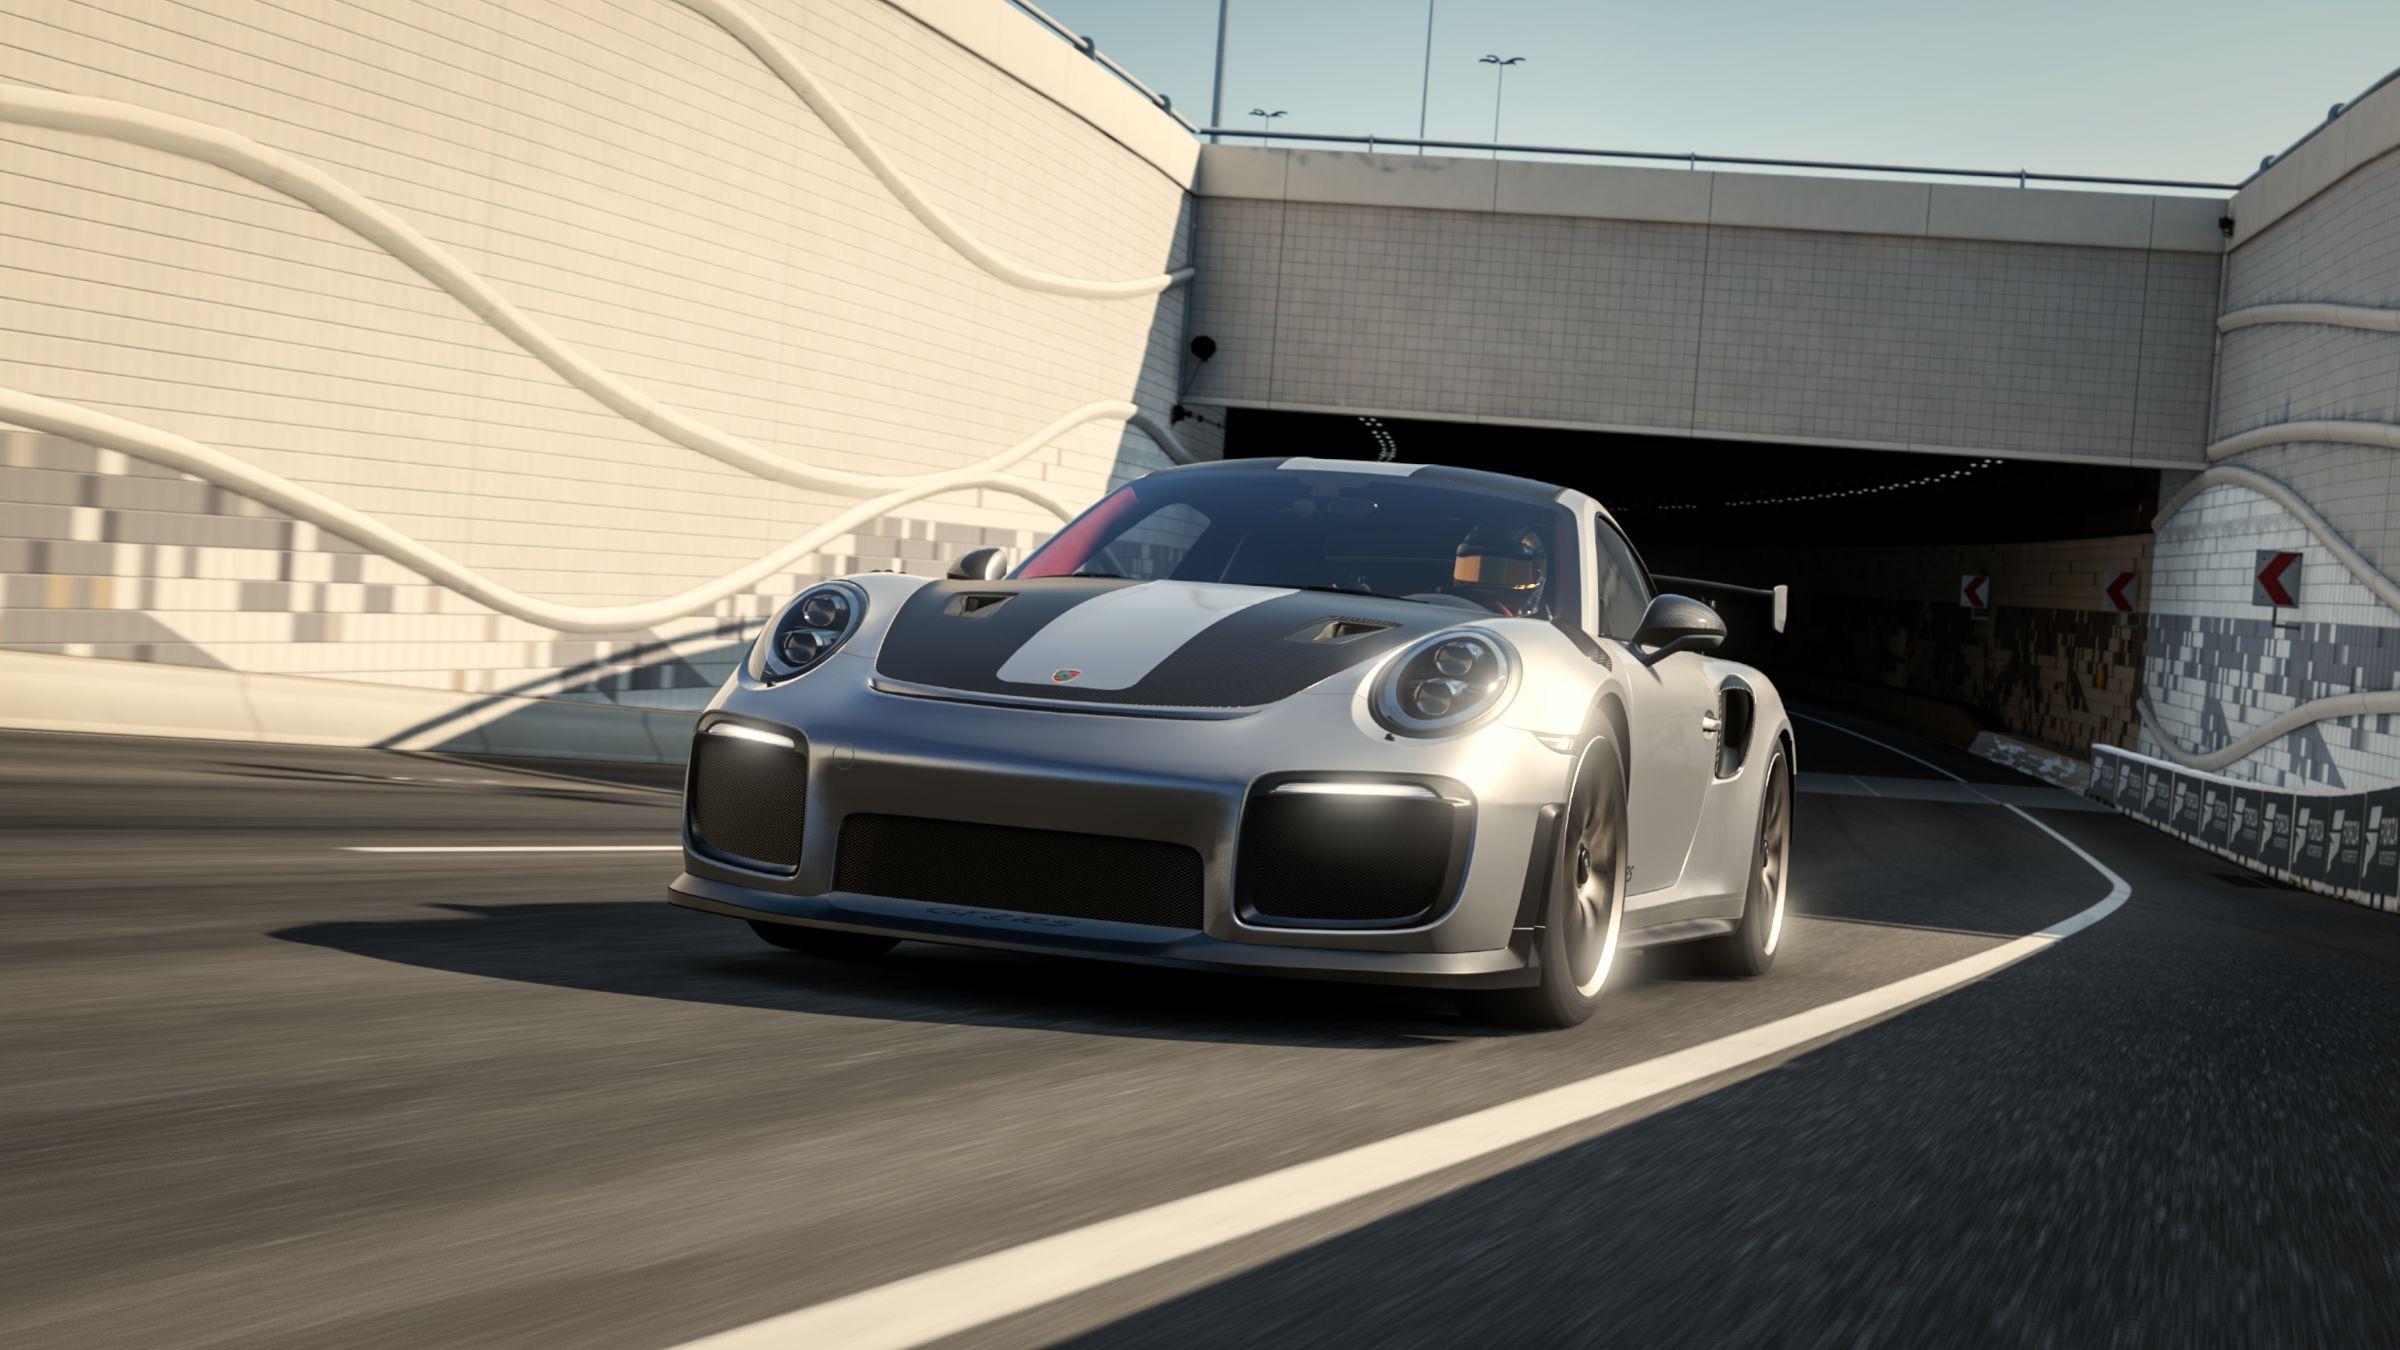 Forza Motorsport 7 Porsche GT2 RS 4K Front